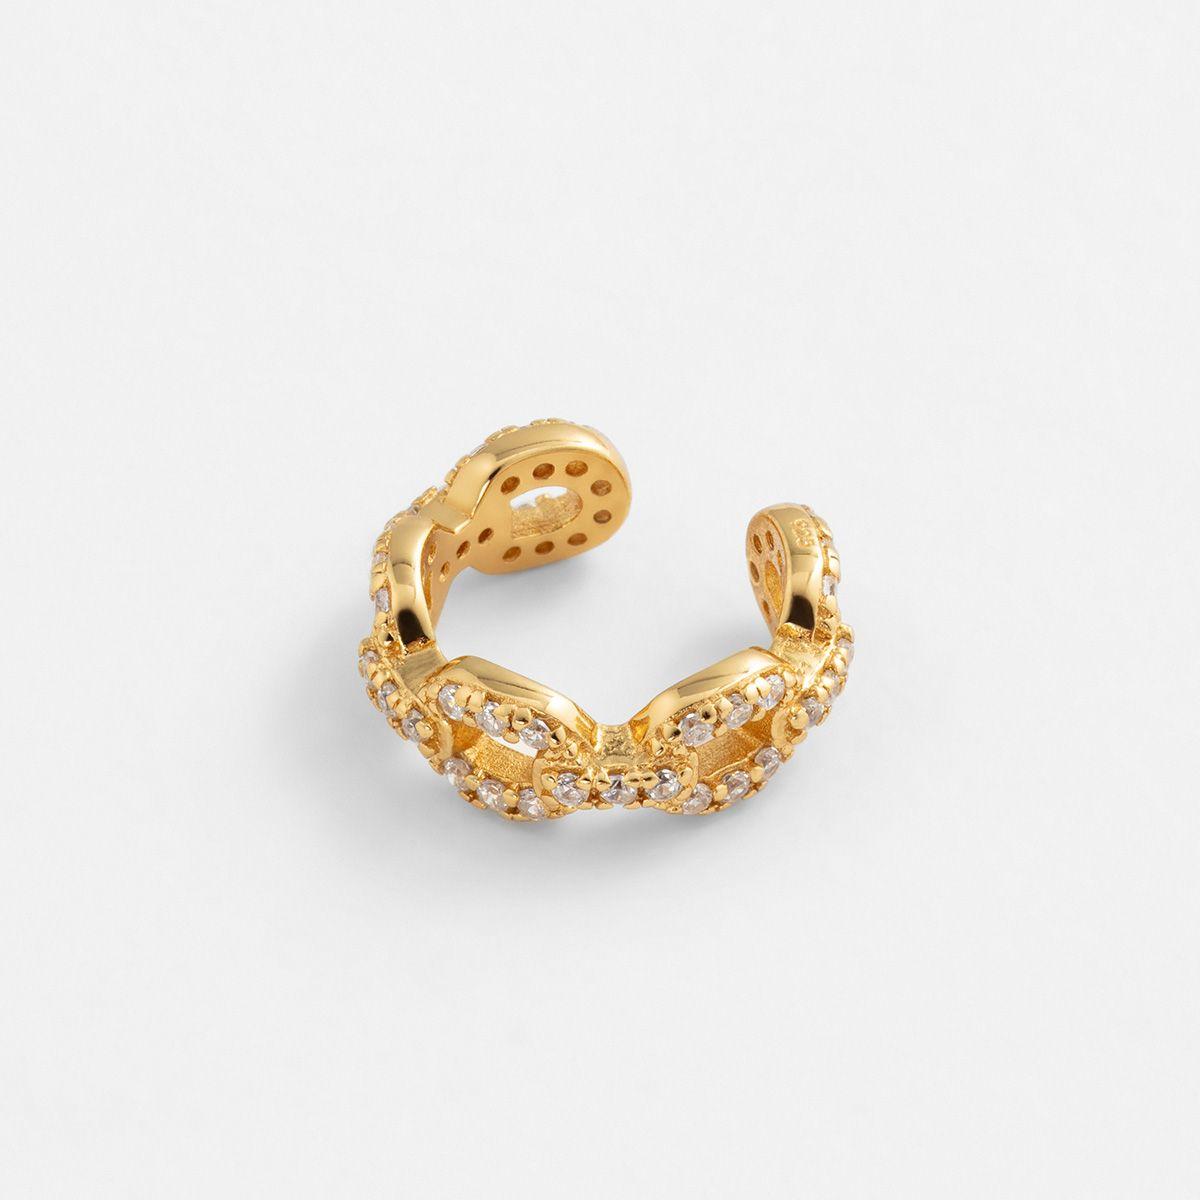 Lola - Earcuffs - Gold